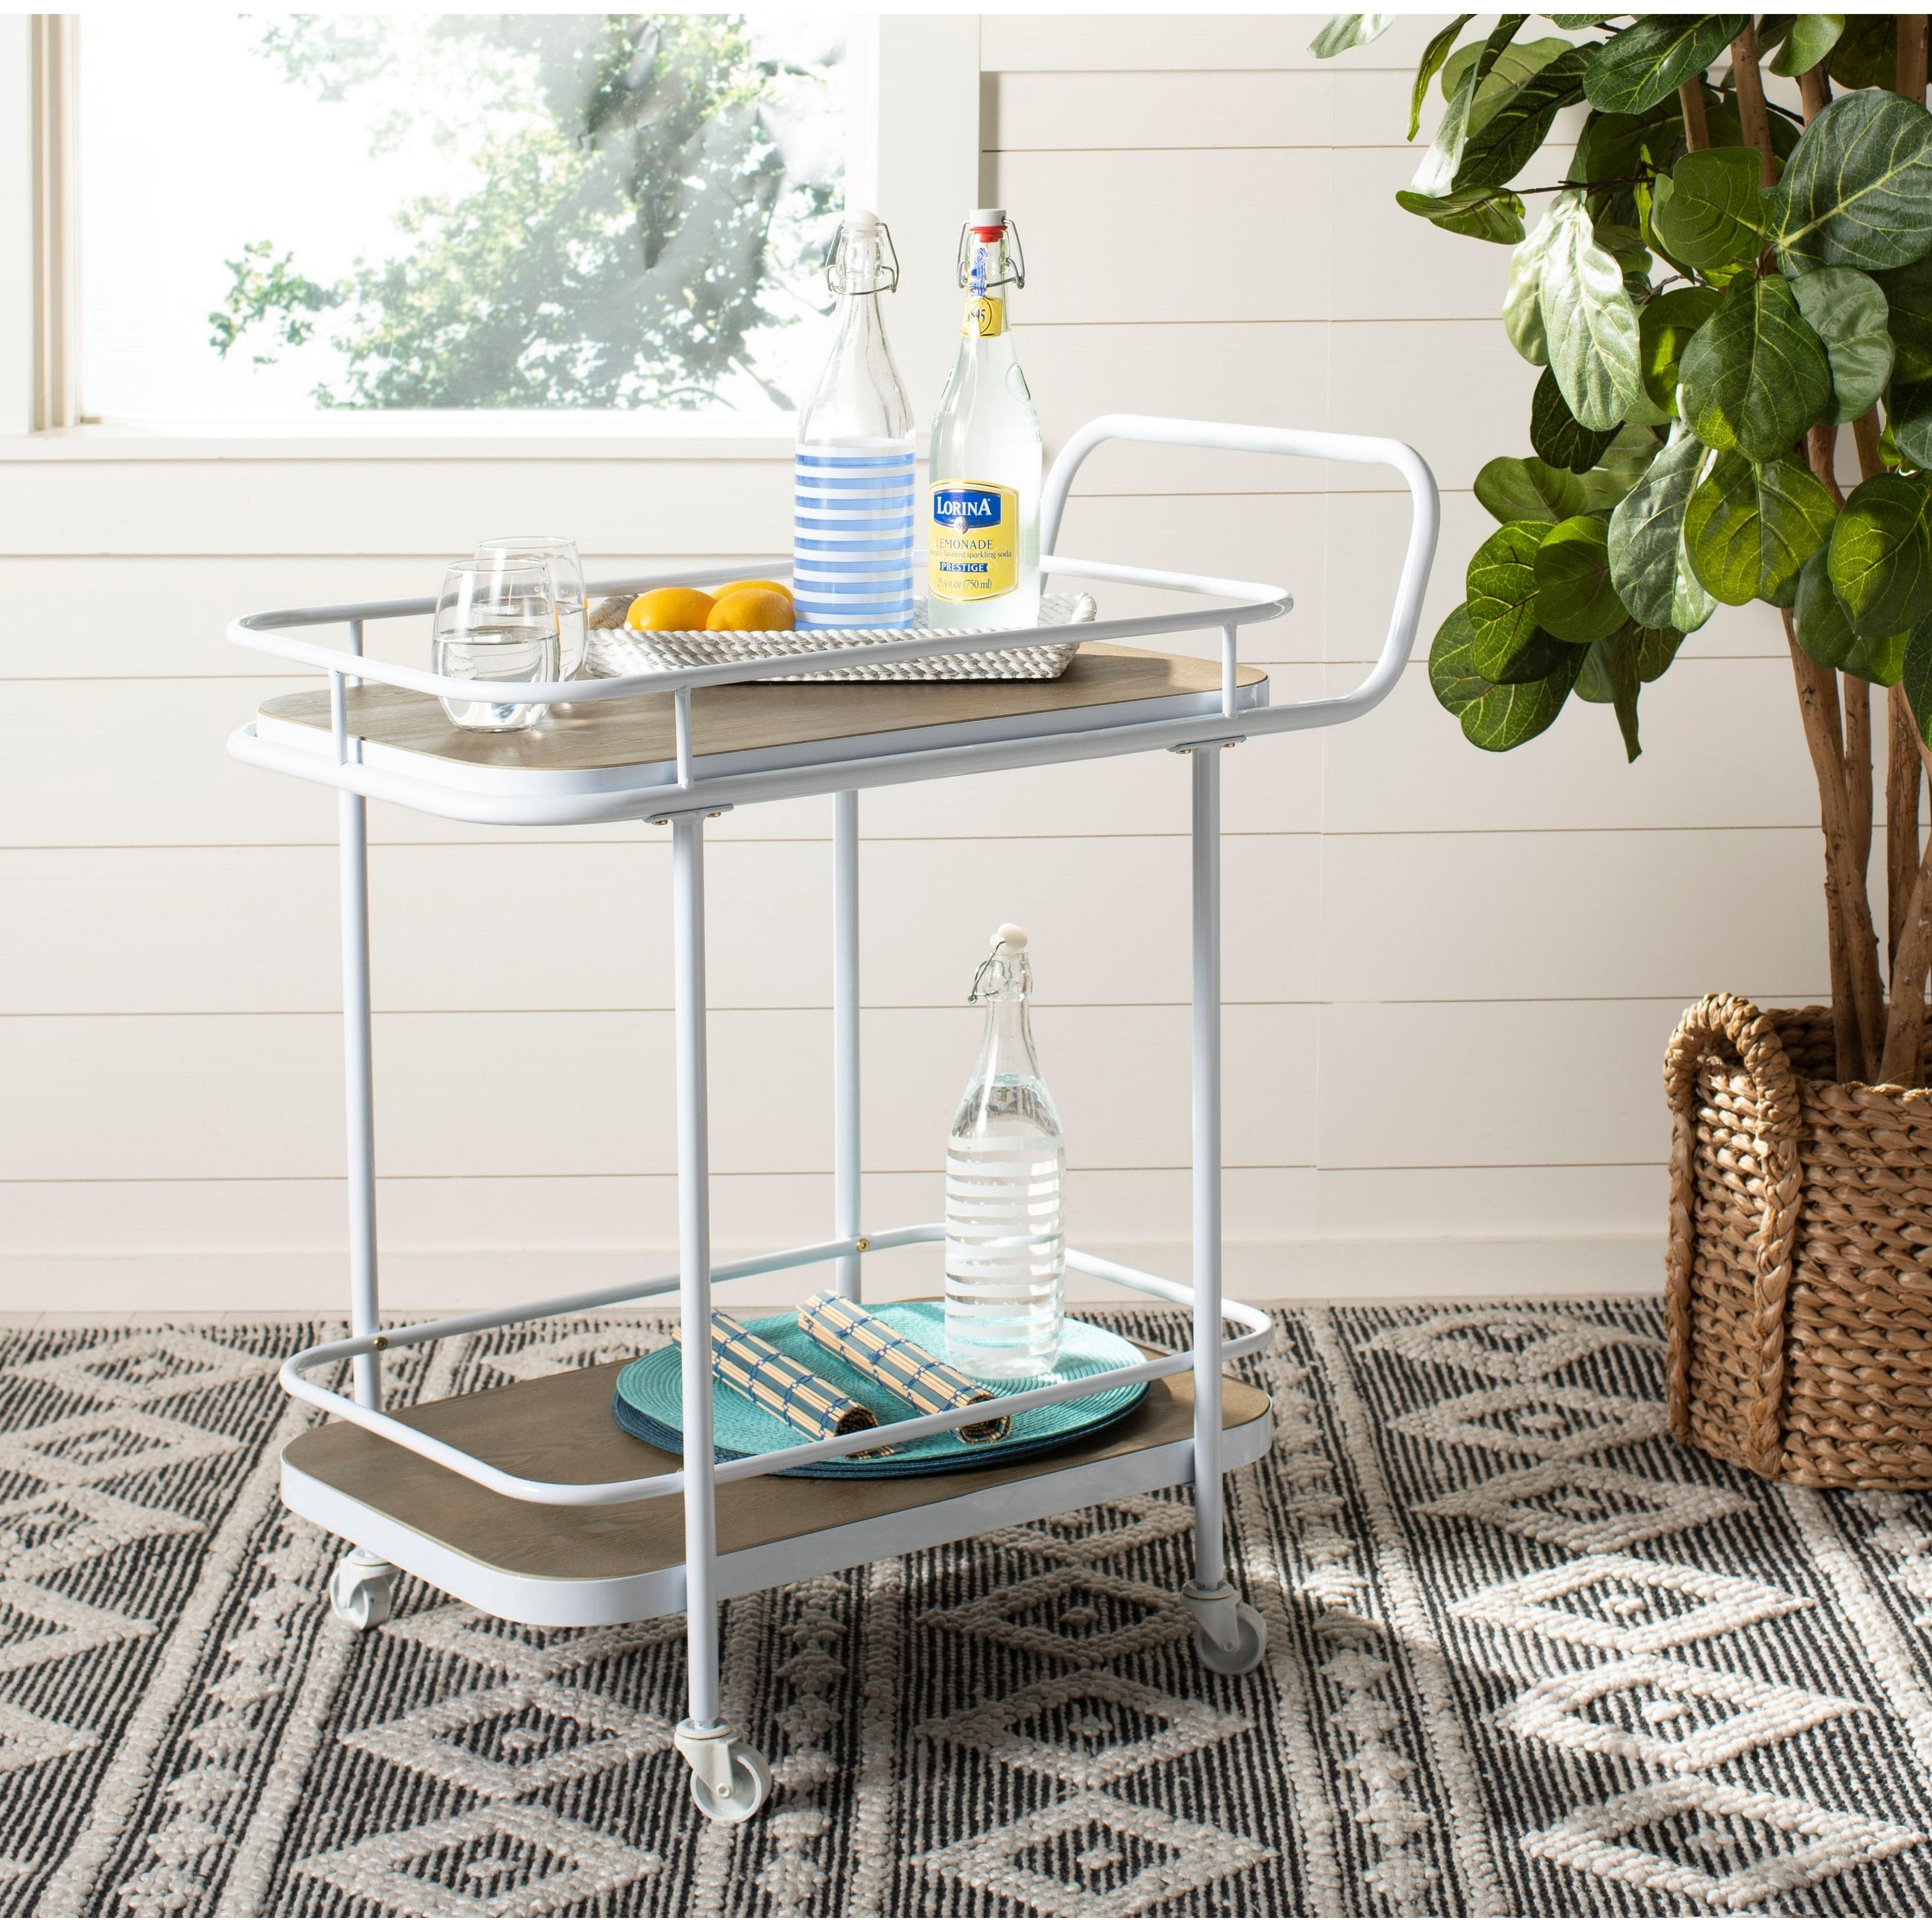 Safavieh Gaia 2 Tier Rectangle Bar Cart Rustic Oak White 30 X 18 X 32 Overstock 23591486